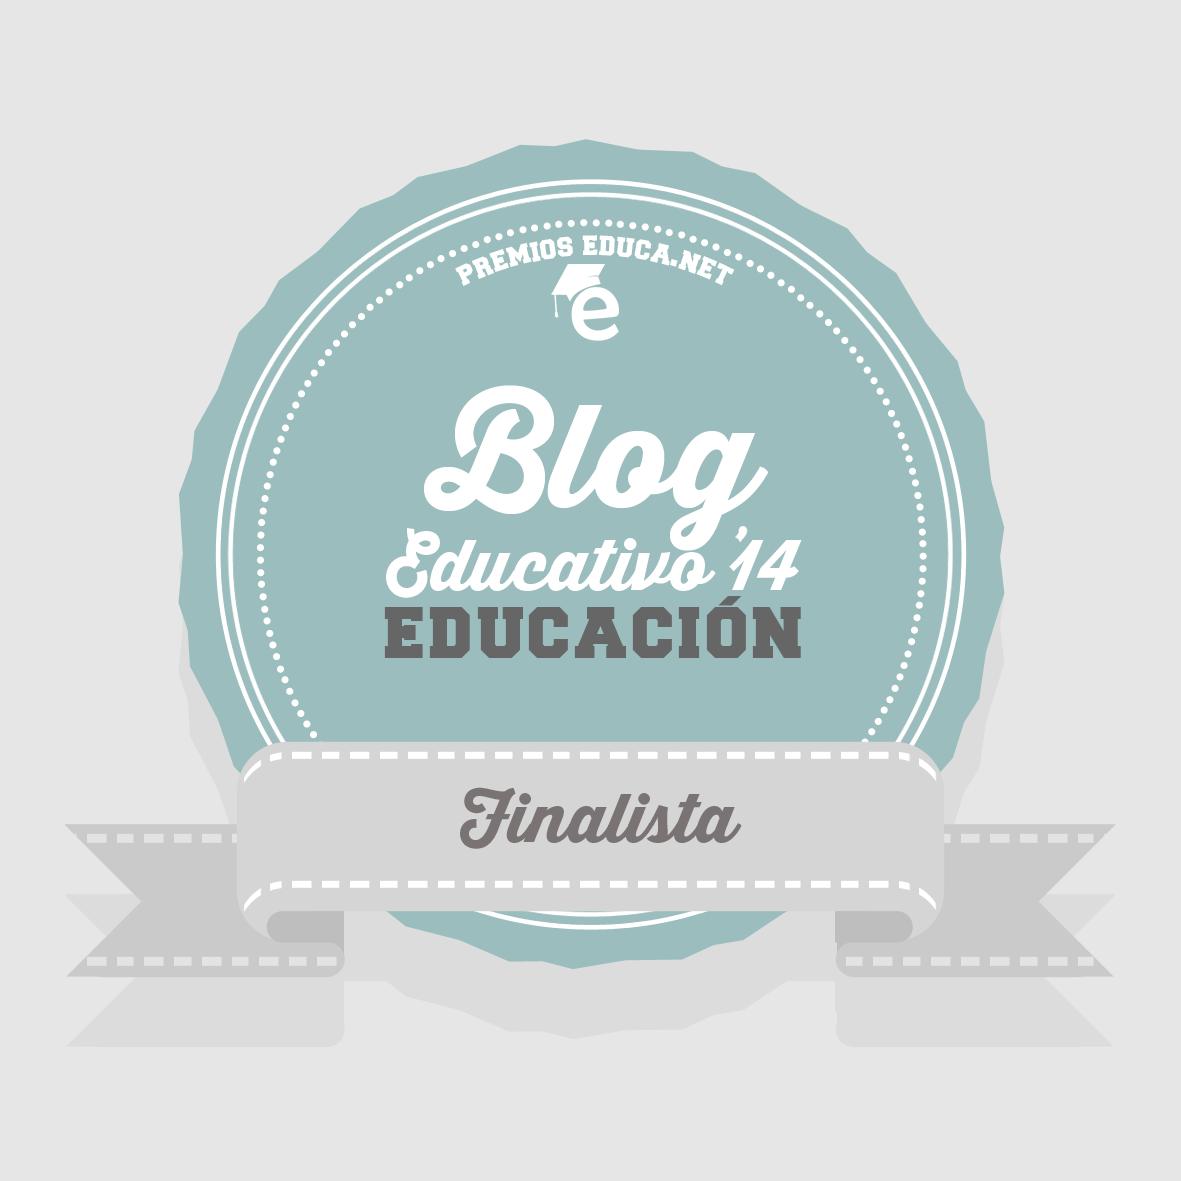 Premos Educa 2014